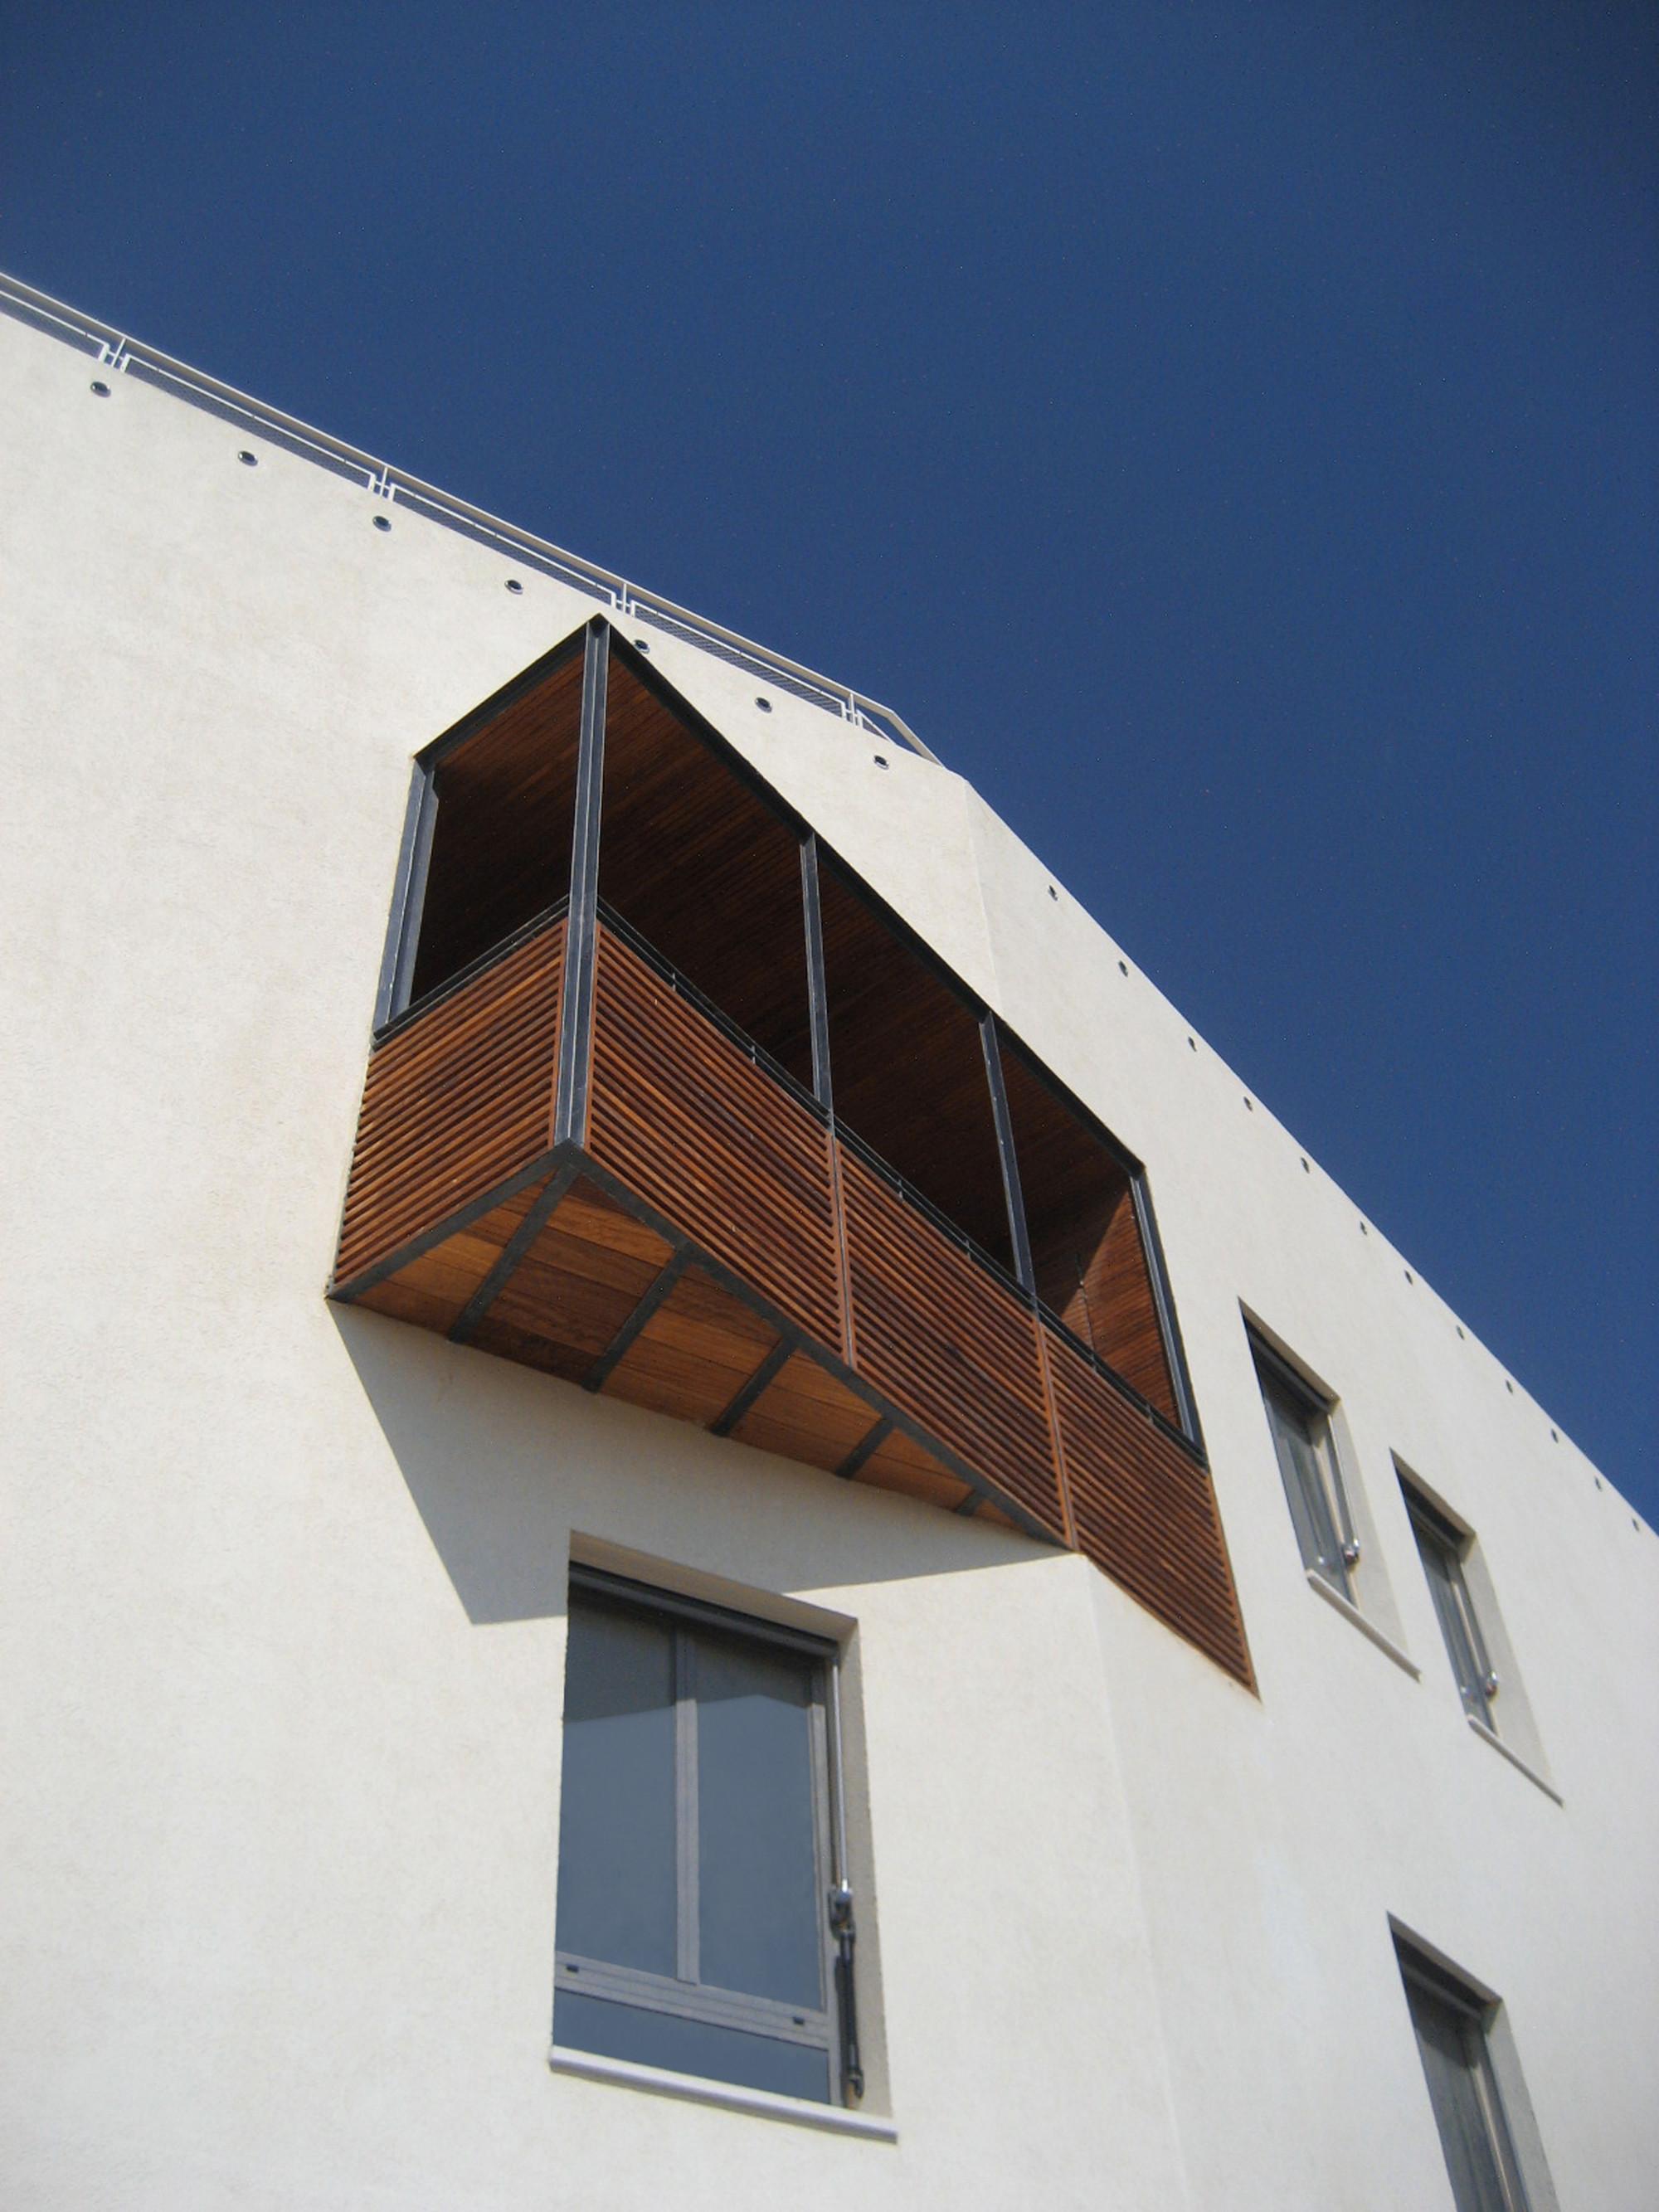 Housing in Jaffa / GalPeleg Architects